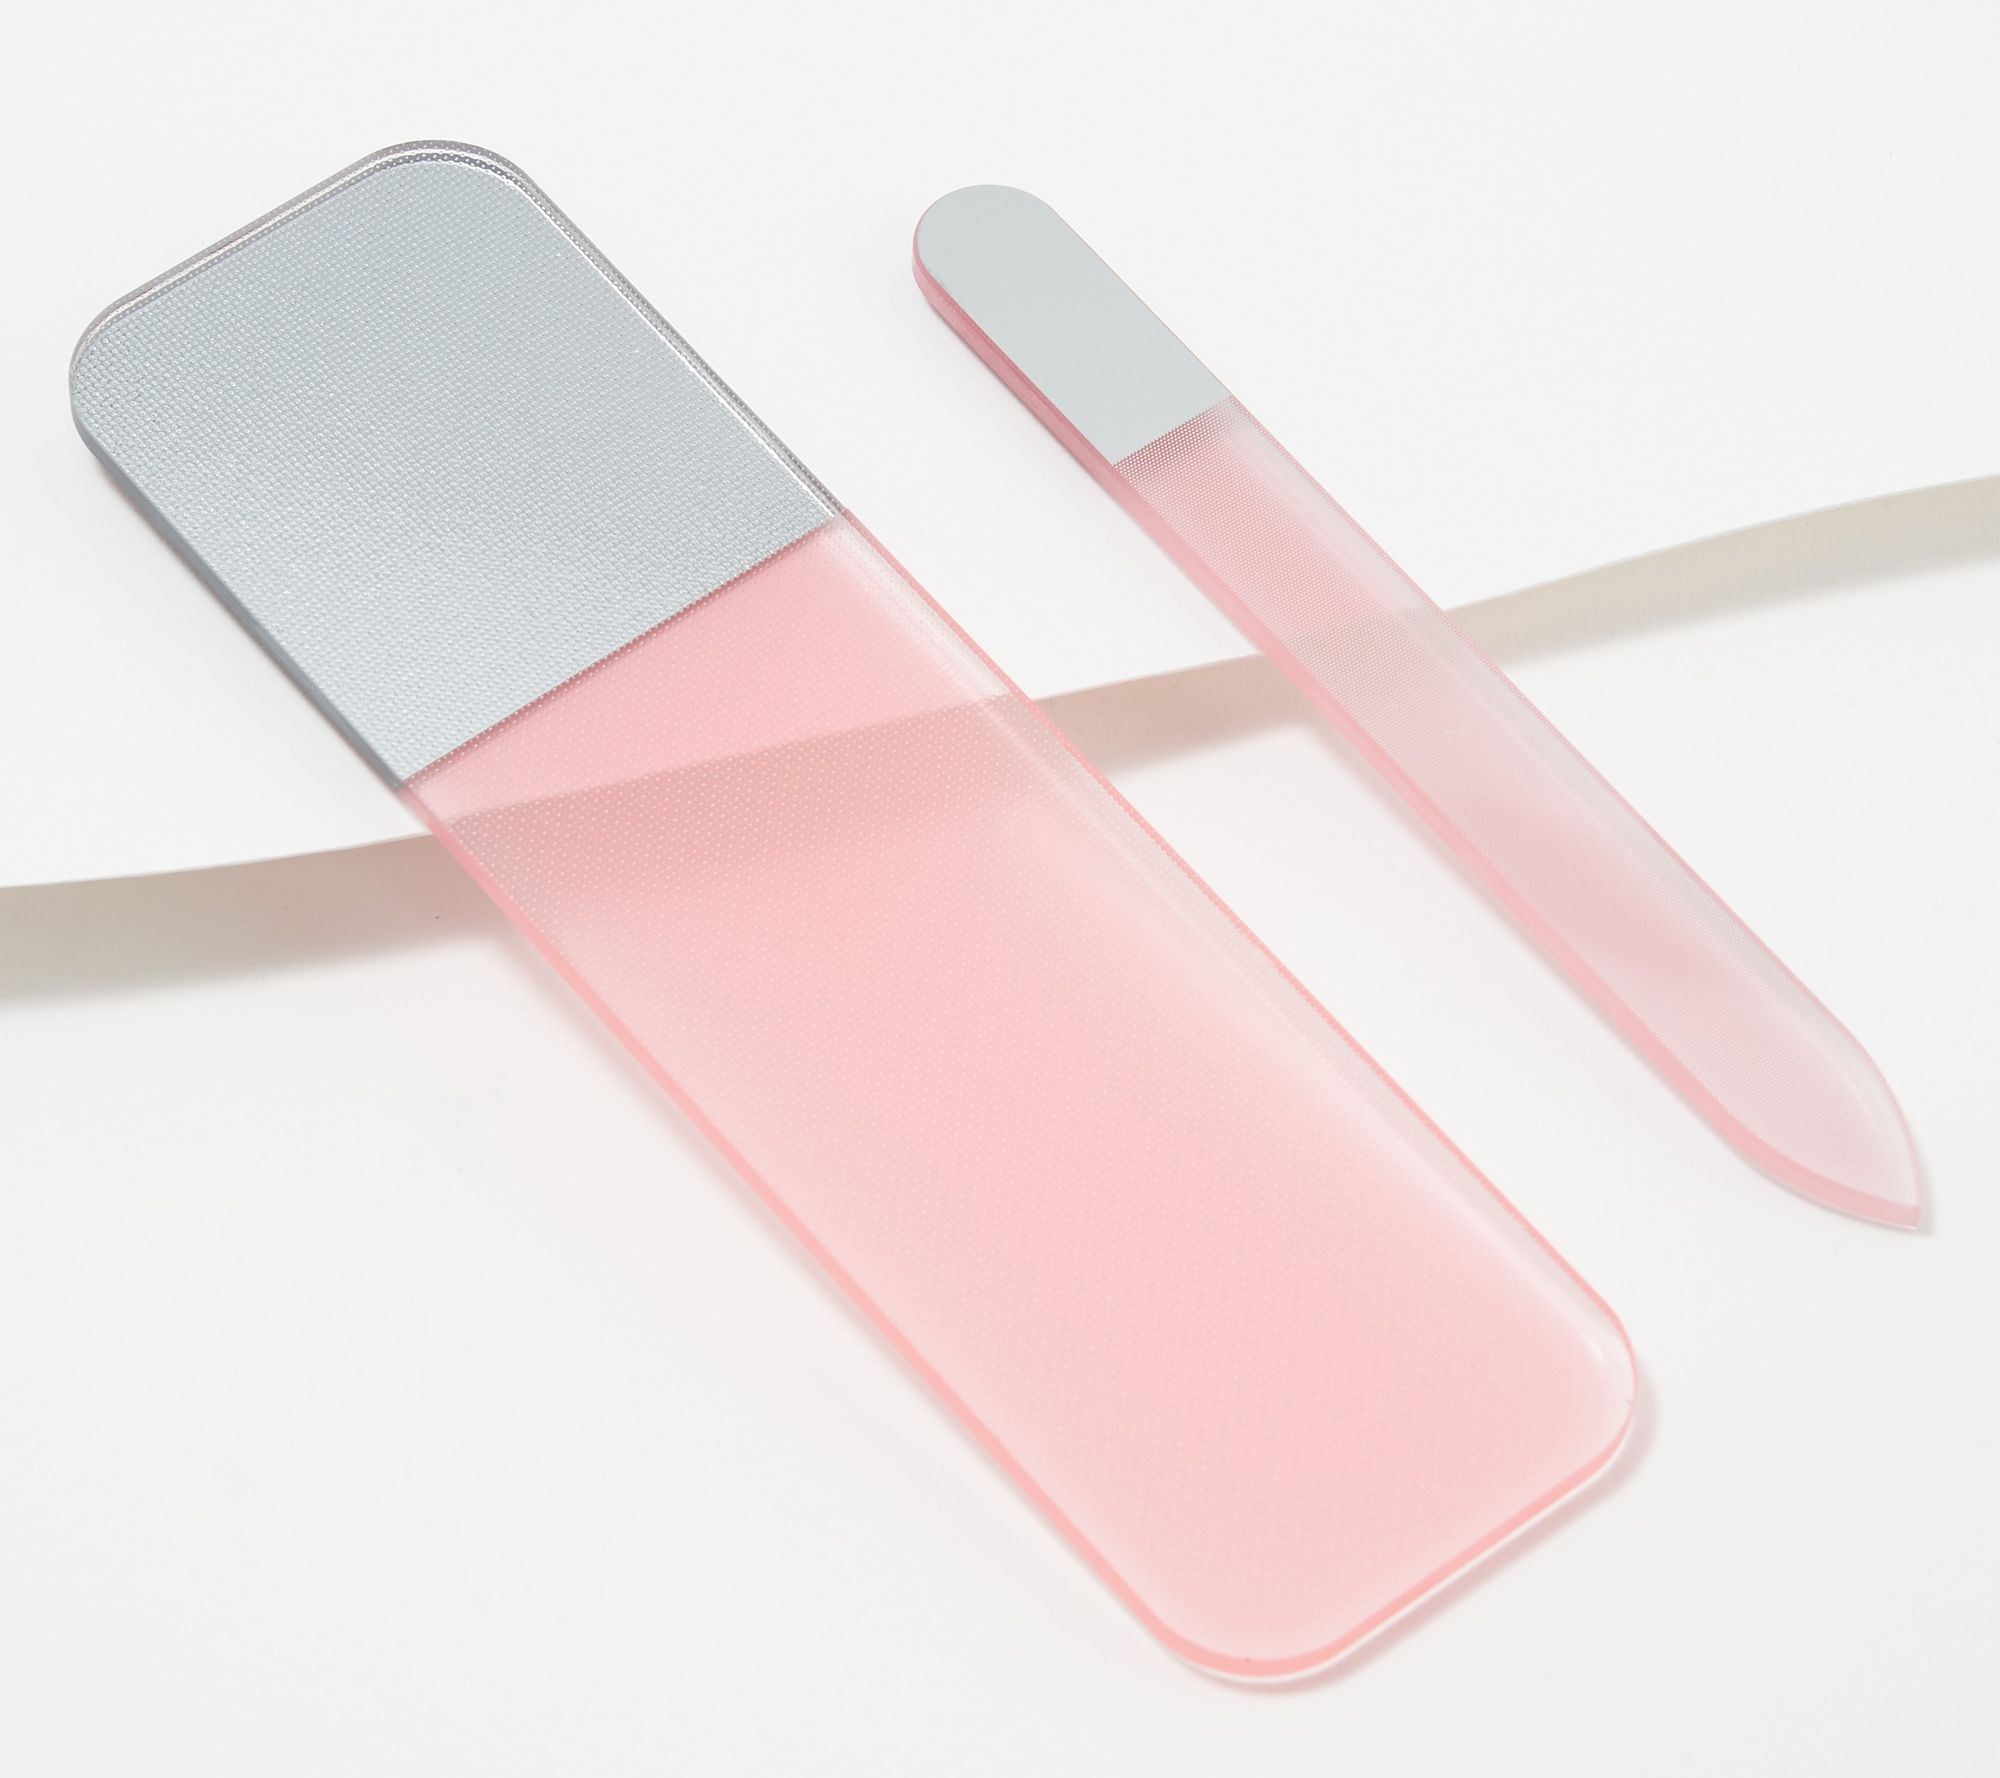 Spa-Rific Laser Etched Hardened Glass Mani-Pedi Set